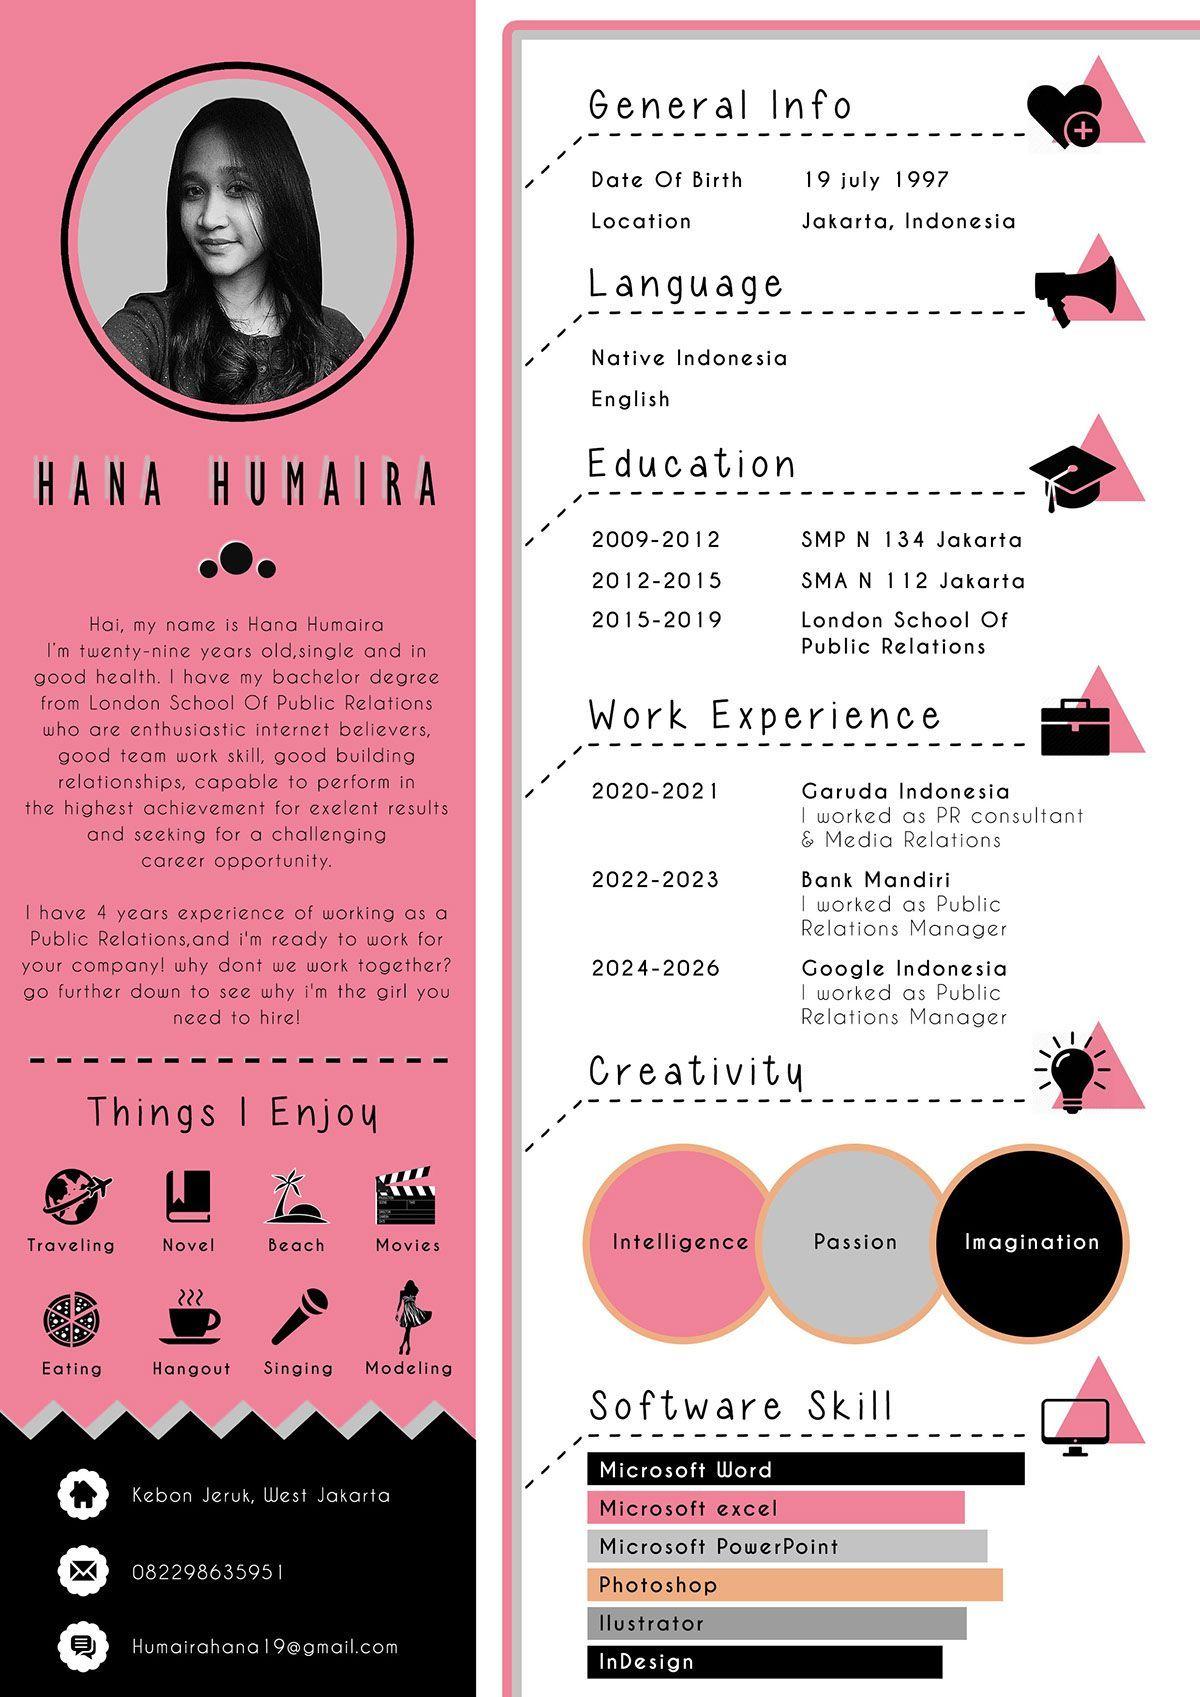 Cv Resume Design Resume Template Ideas Of Resume Template Resumetemplate Cv Resume Design On Behance Cv Kreatif Desain Resume Desain Cv